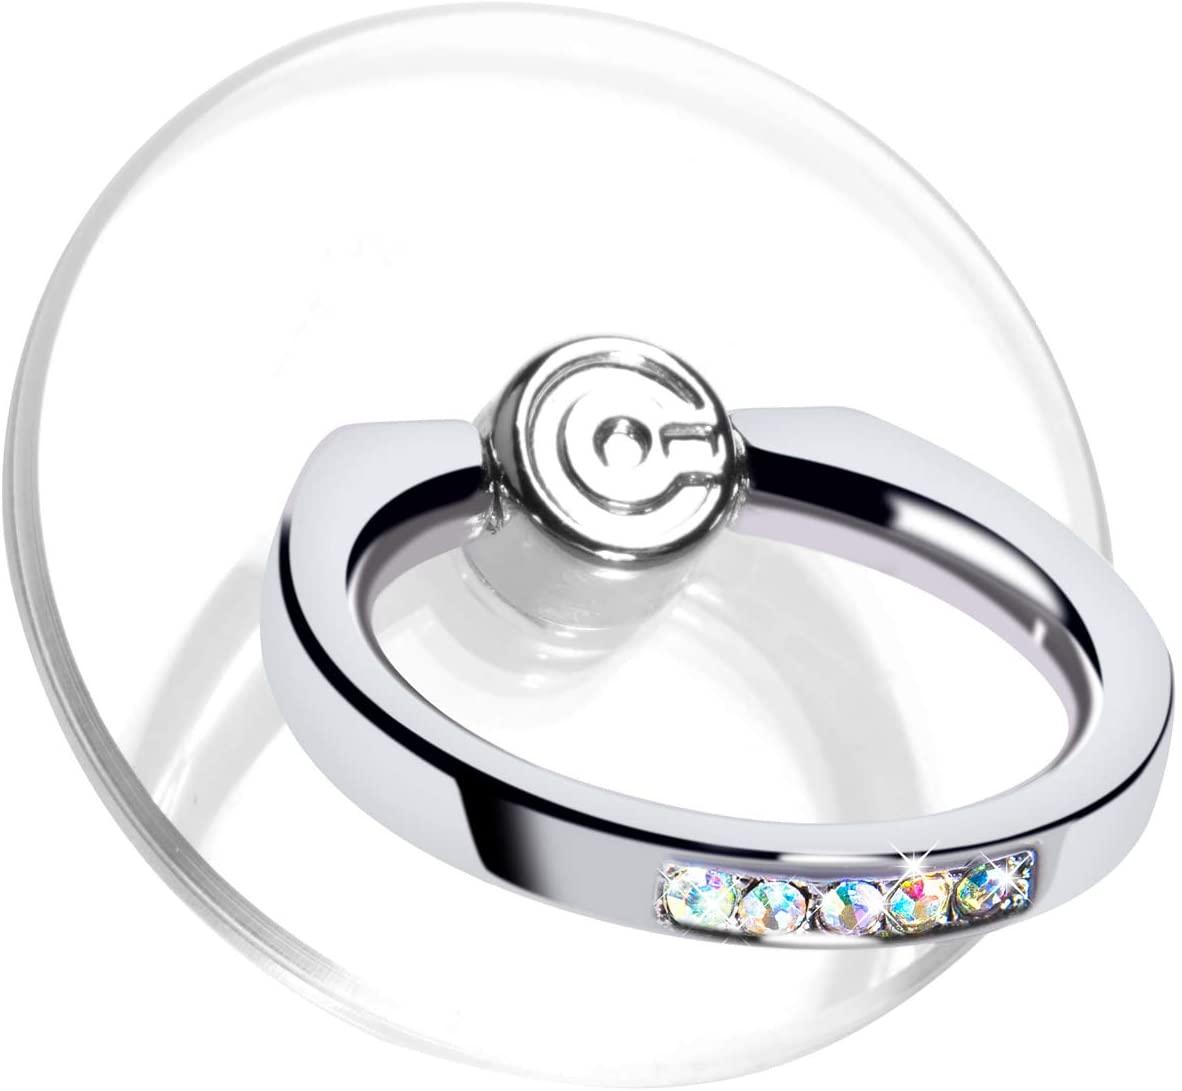 Transparent Phone Ring Stand Holder - EI Sonador Cell Phone Ring Holder Finger Grip 360 Degree Rotation (2 Colorful Diamond)